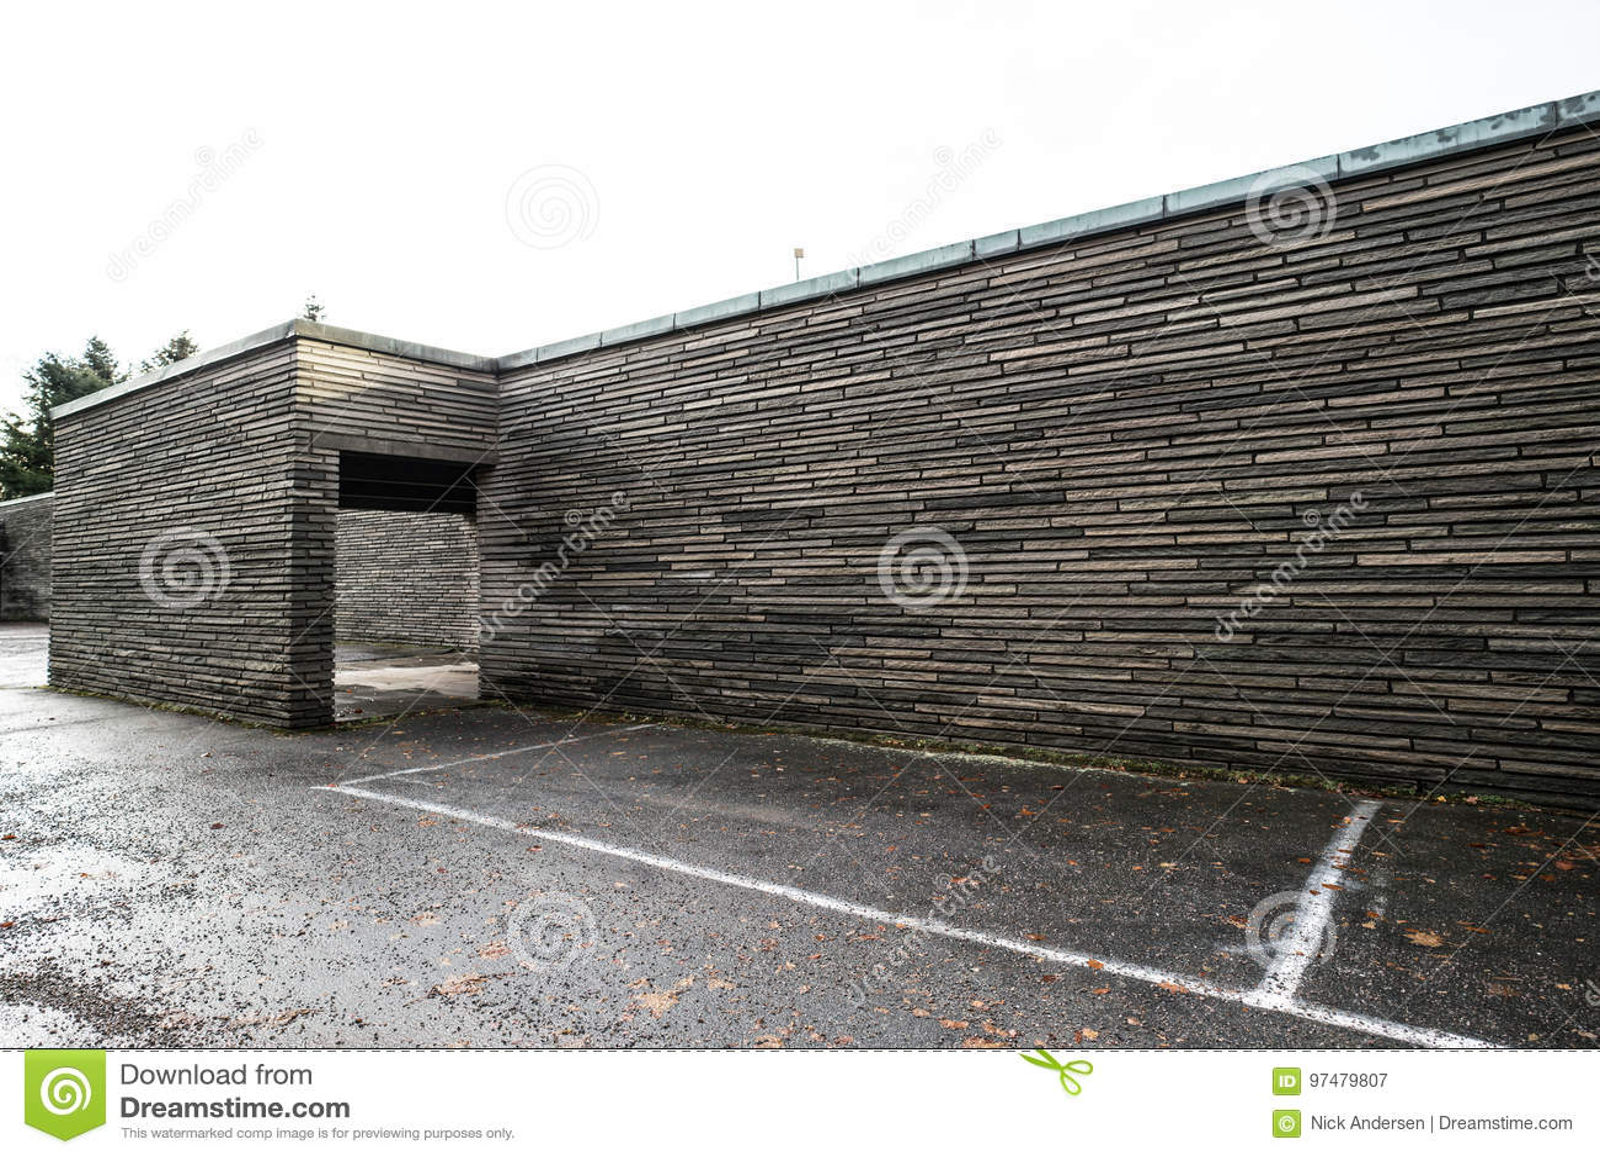 Architettura in Europa